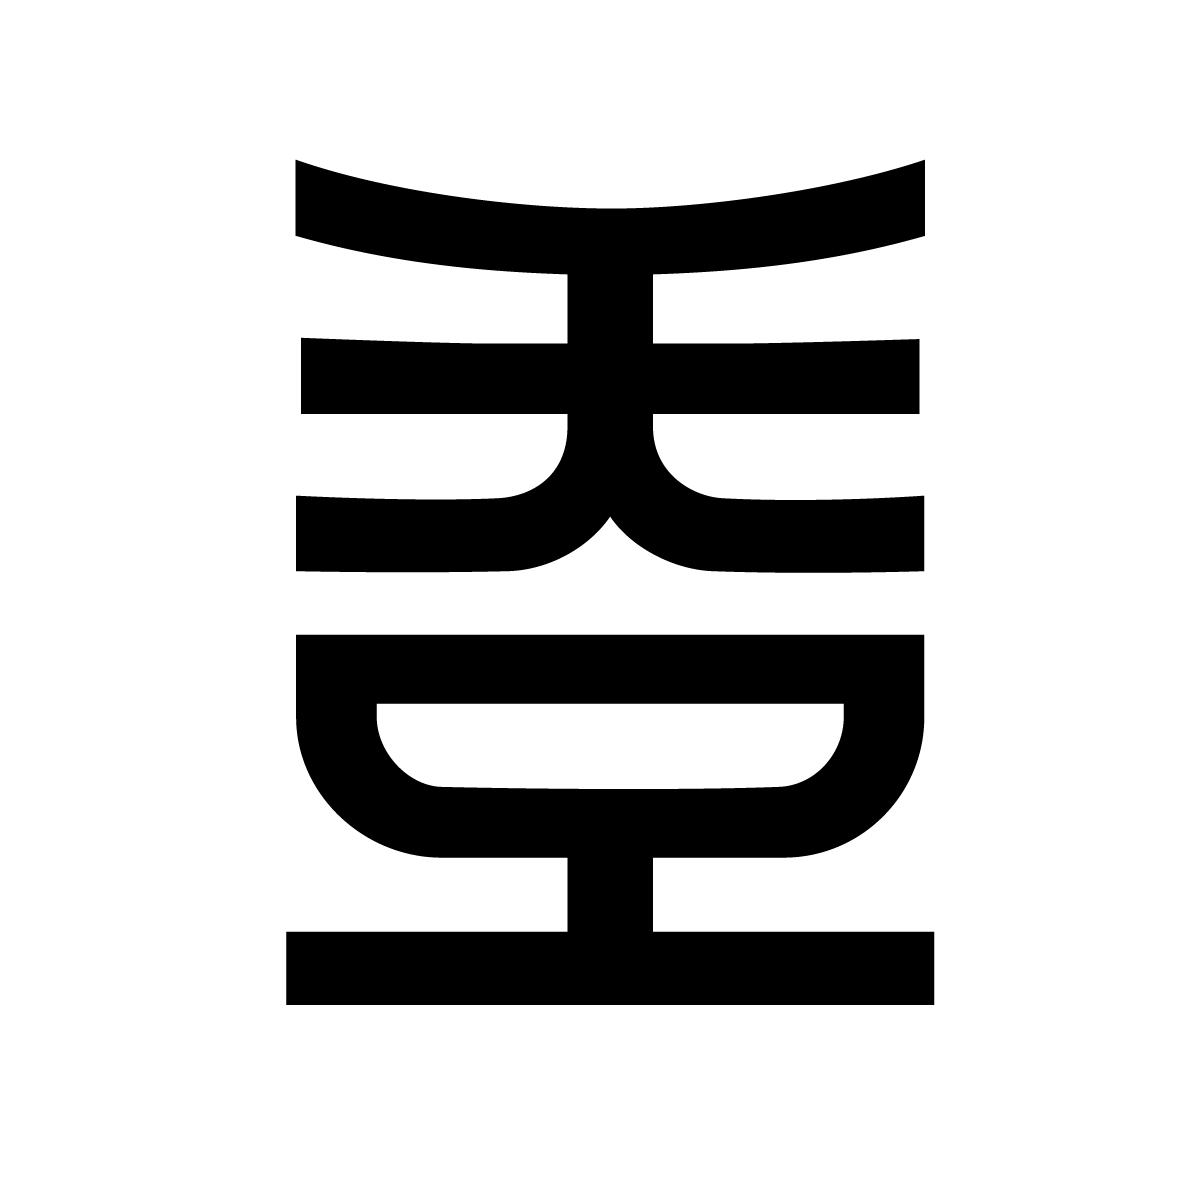 HKDI logo design by logo designer Designmind